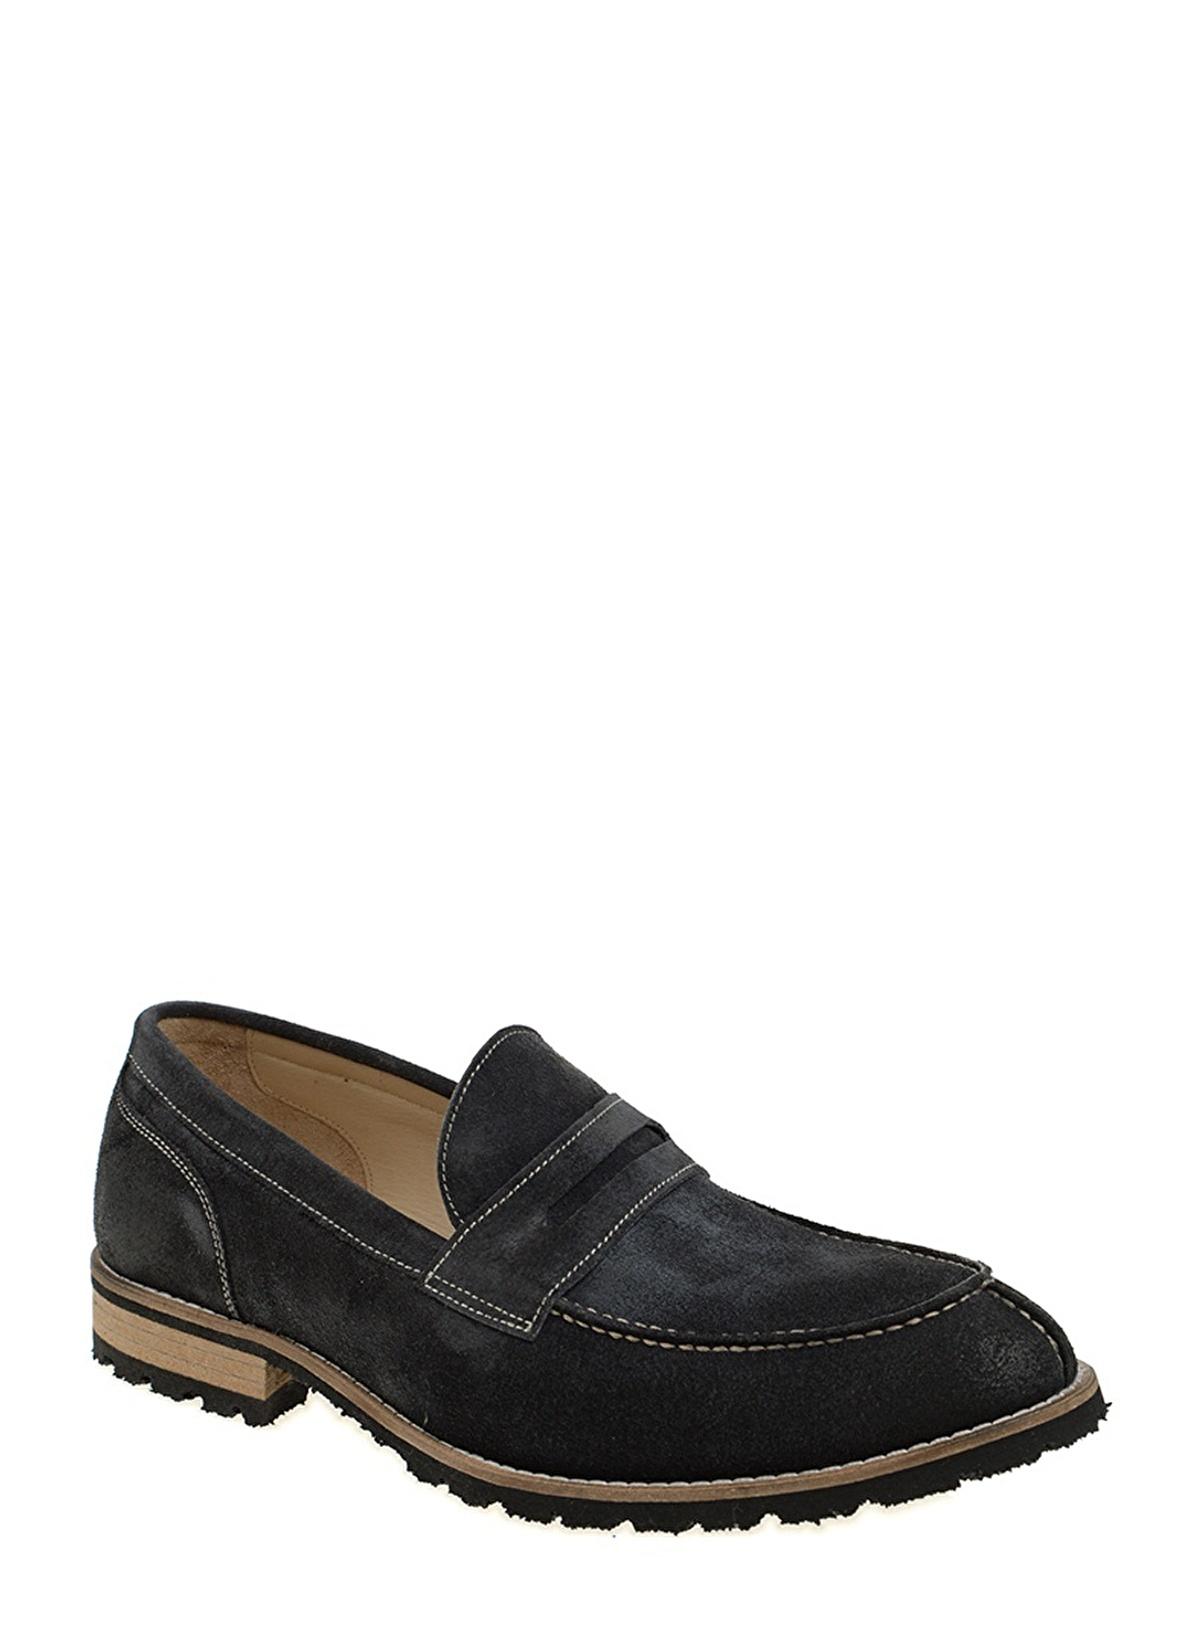 Divarese Ayakkabı 5014840-e-loafer – 179.0 TL